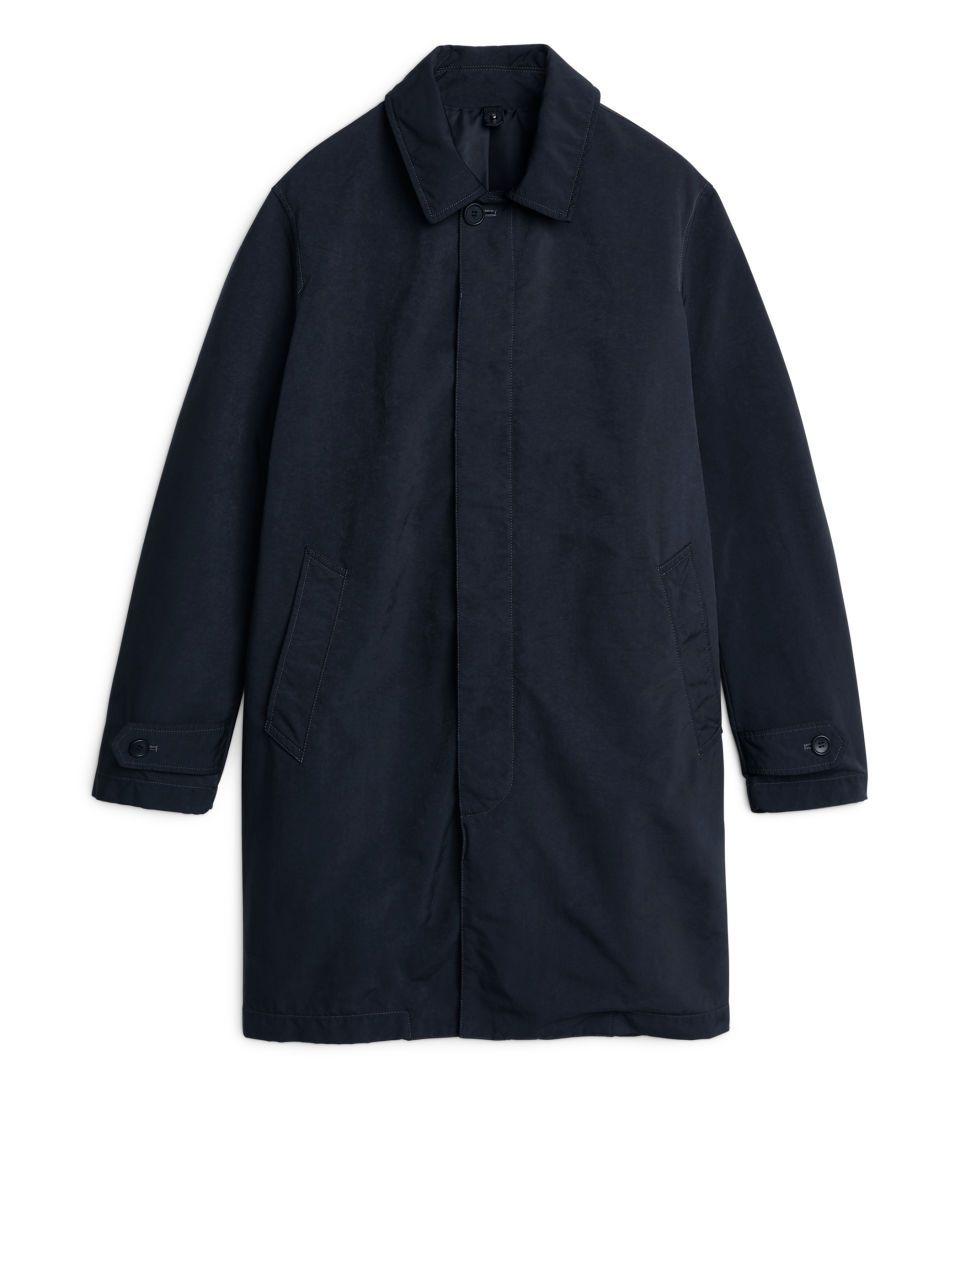 Front image of Arket lightweight topcoat in blue | Jackets